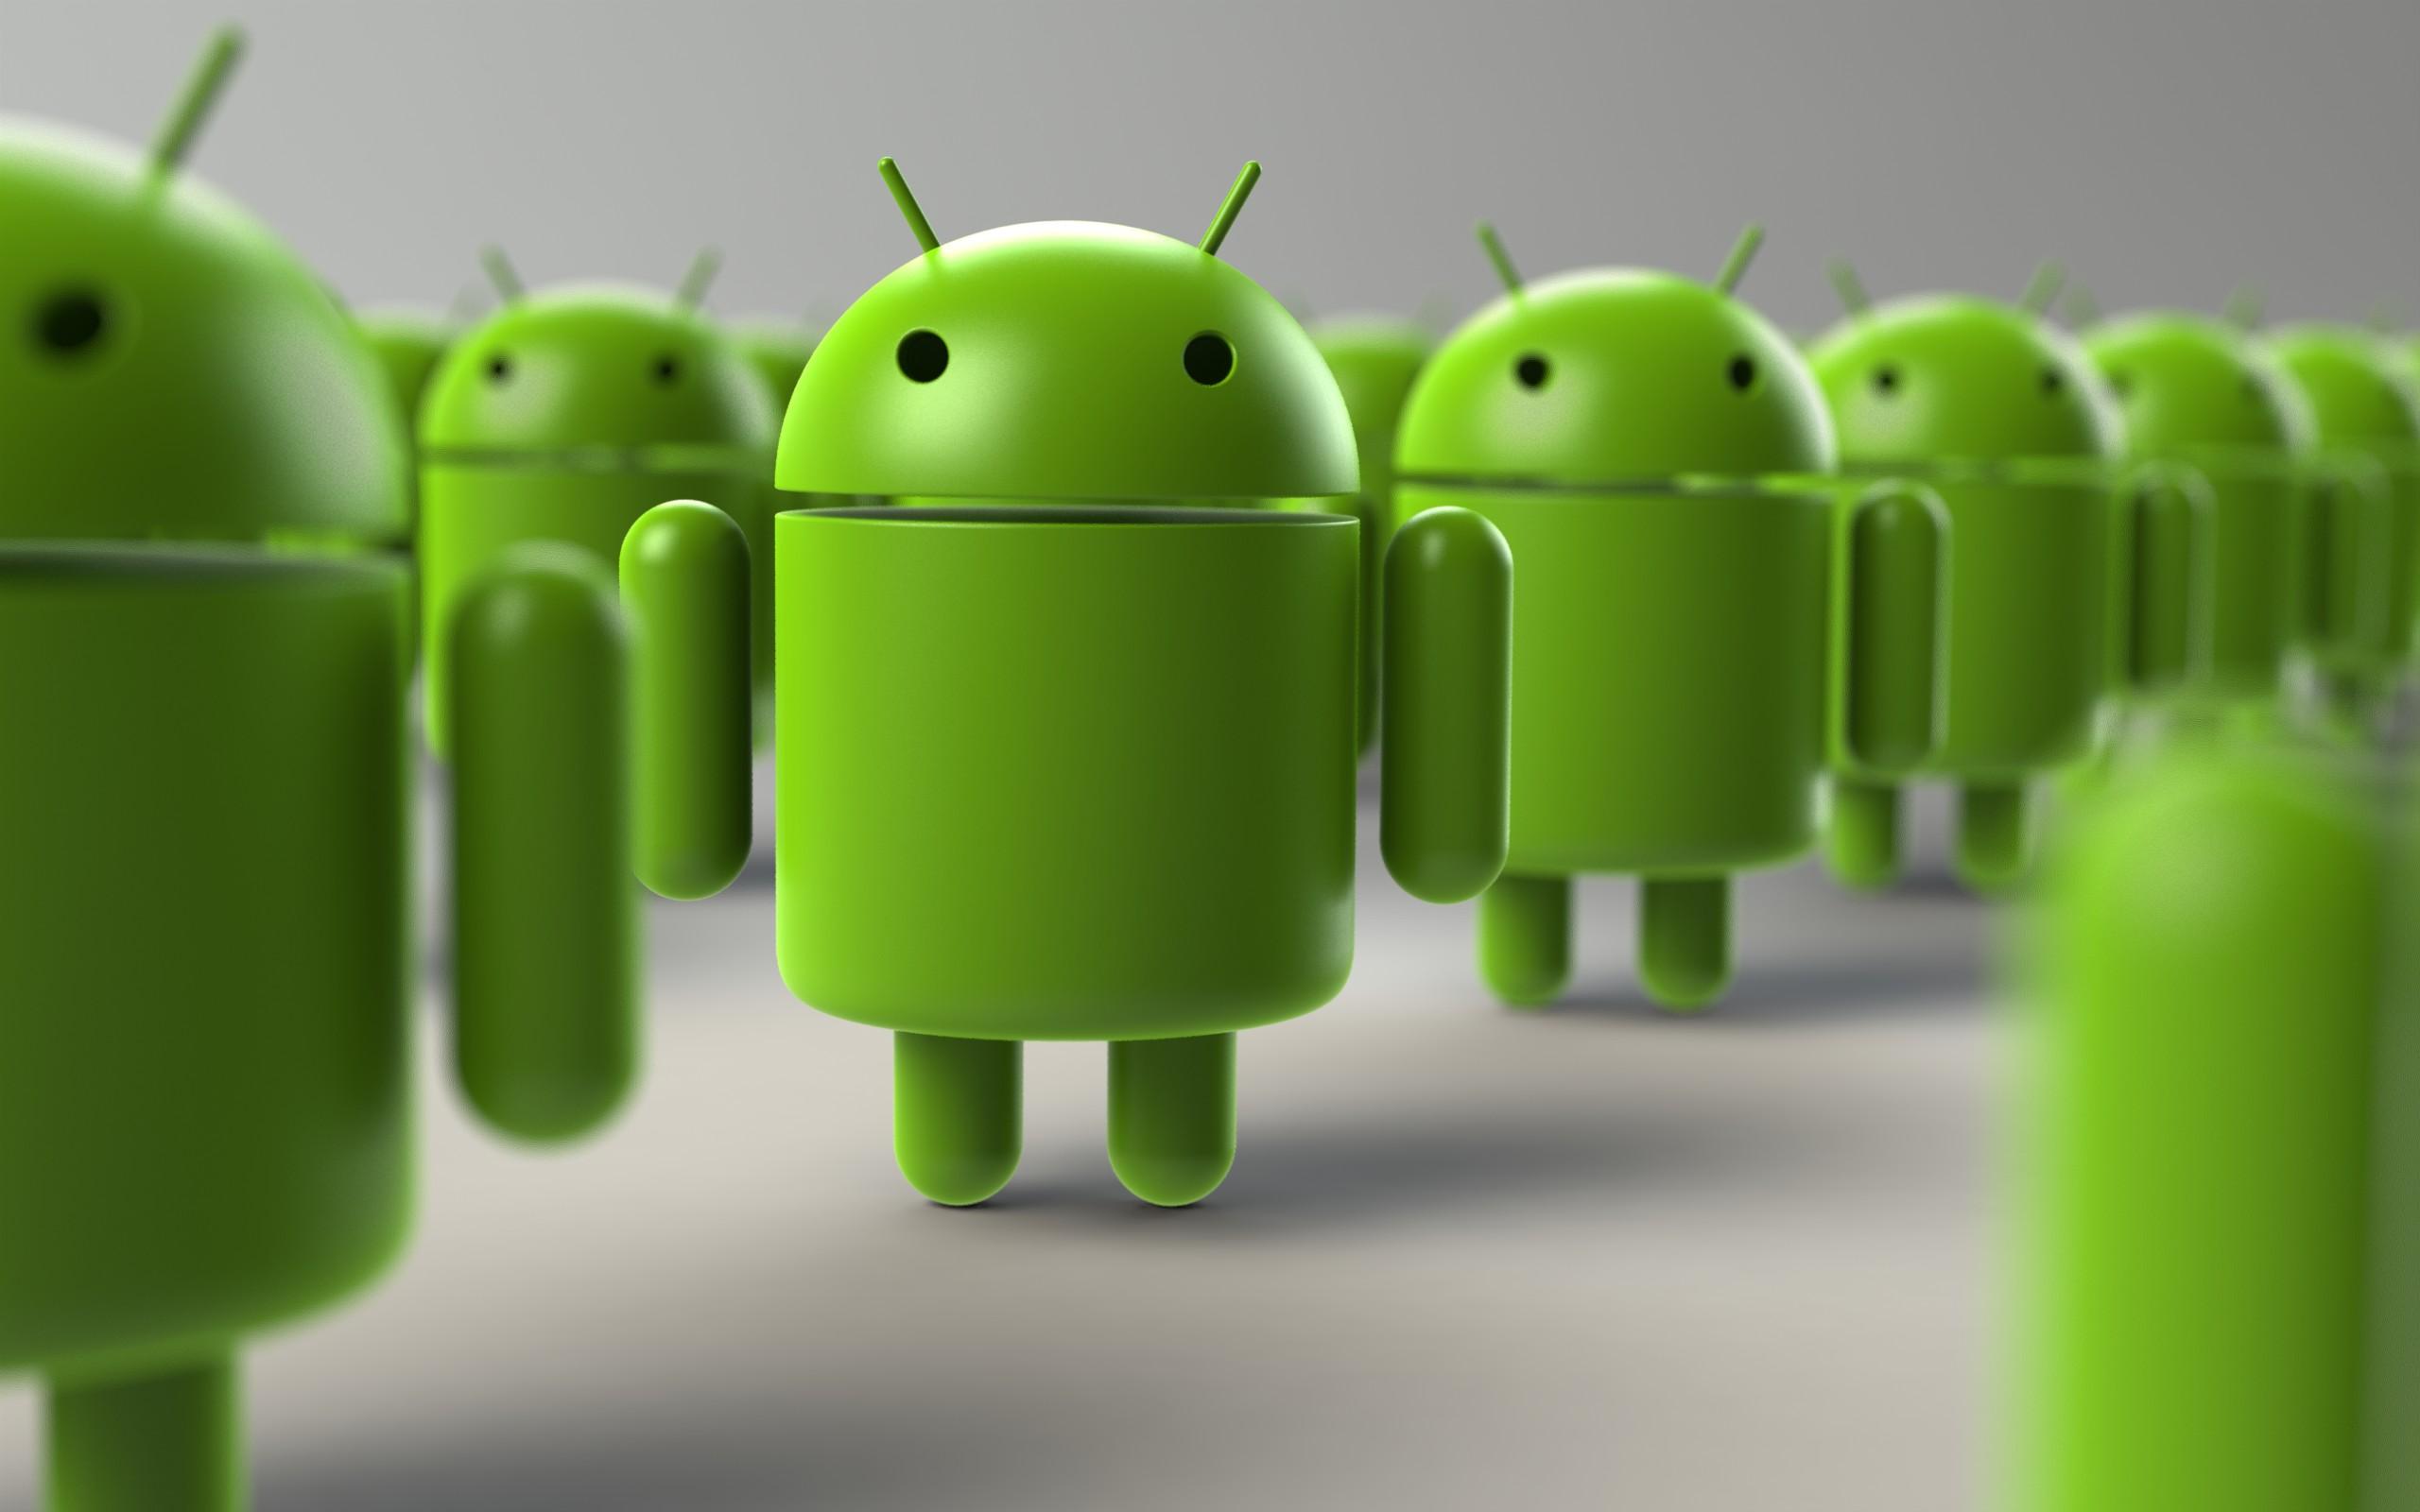 Android telefona uygulama yükleme, android uygulama yükleme, cep telefonu uygulaması